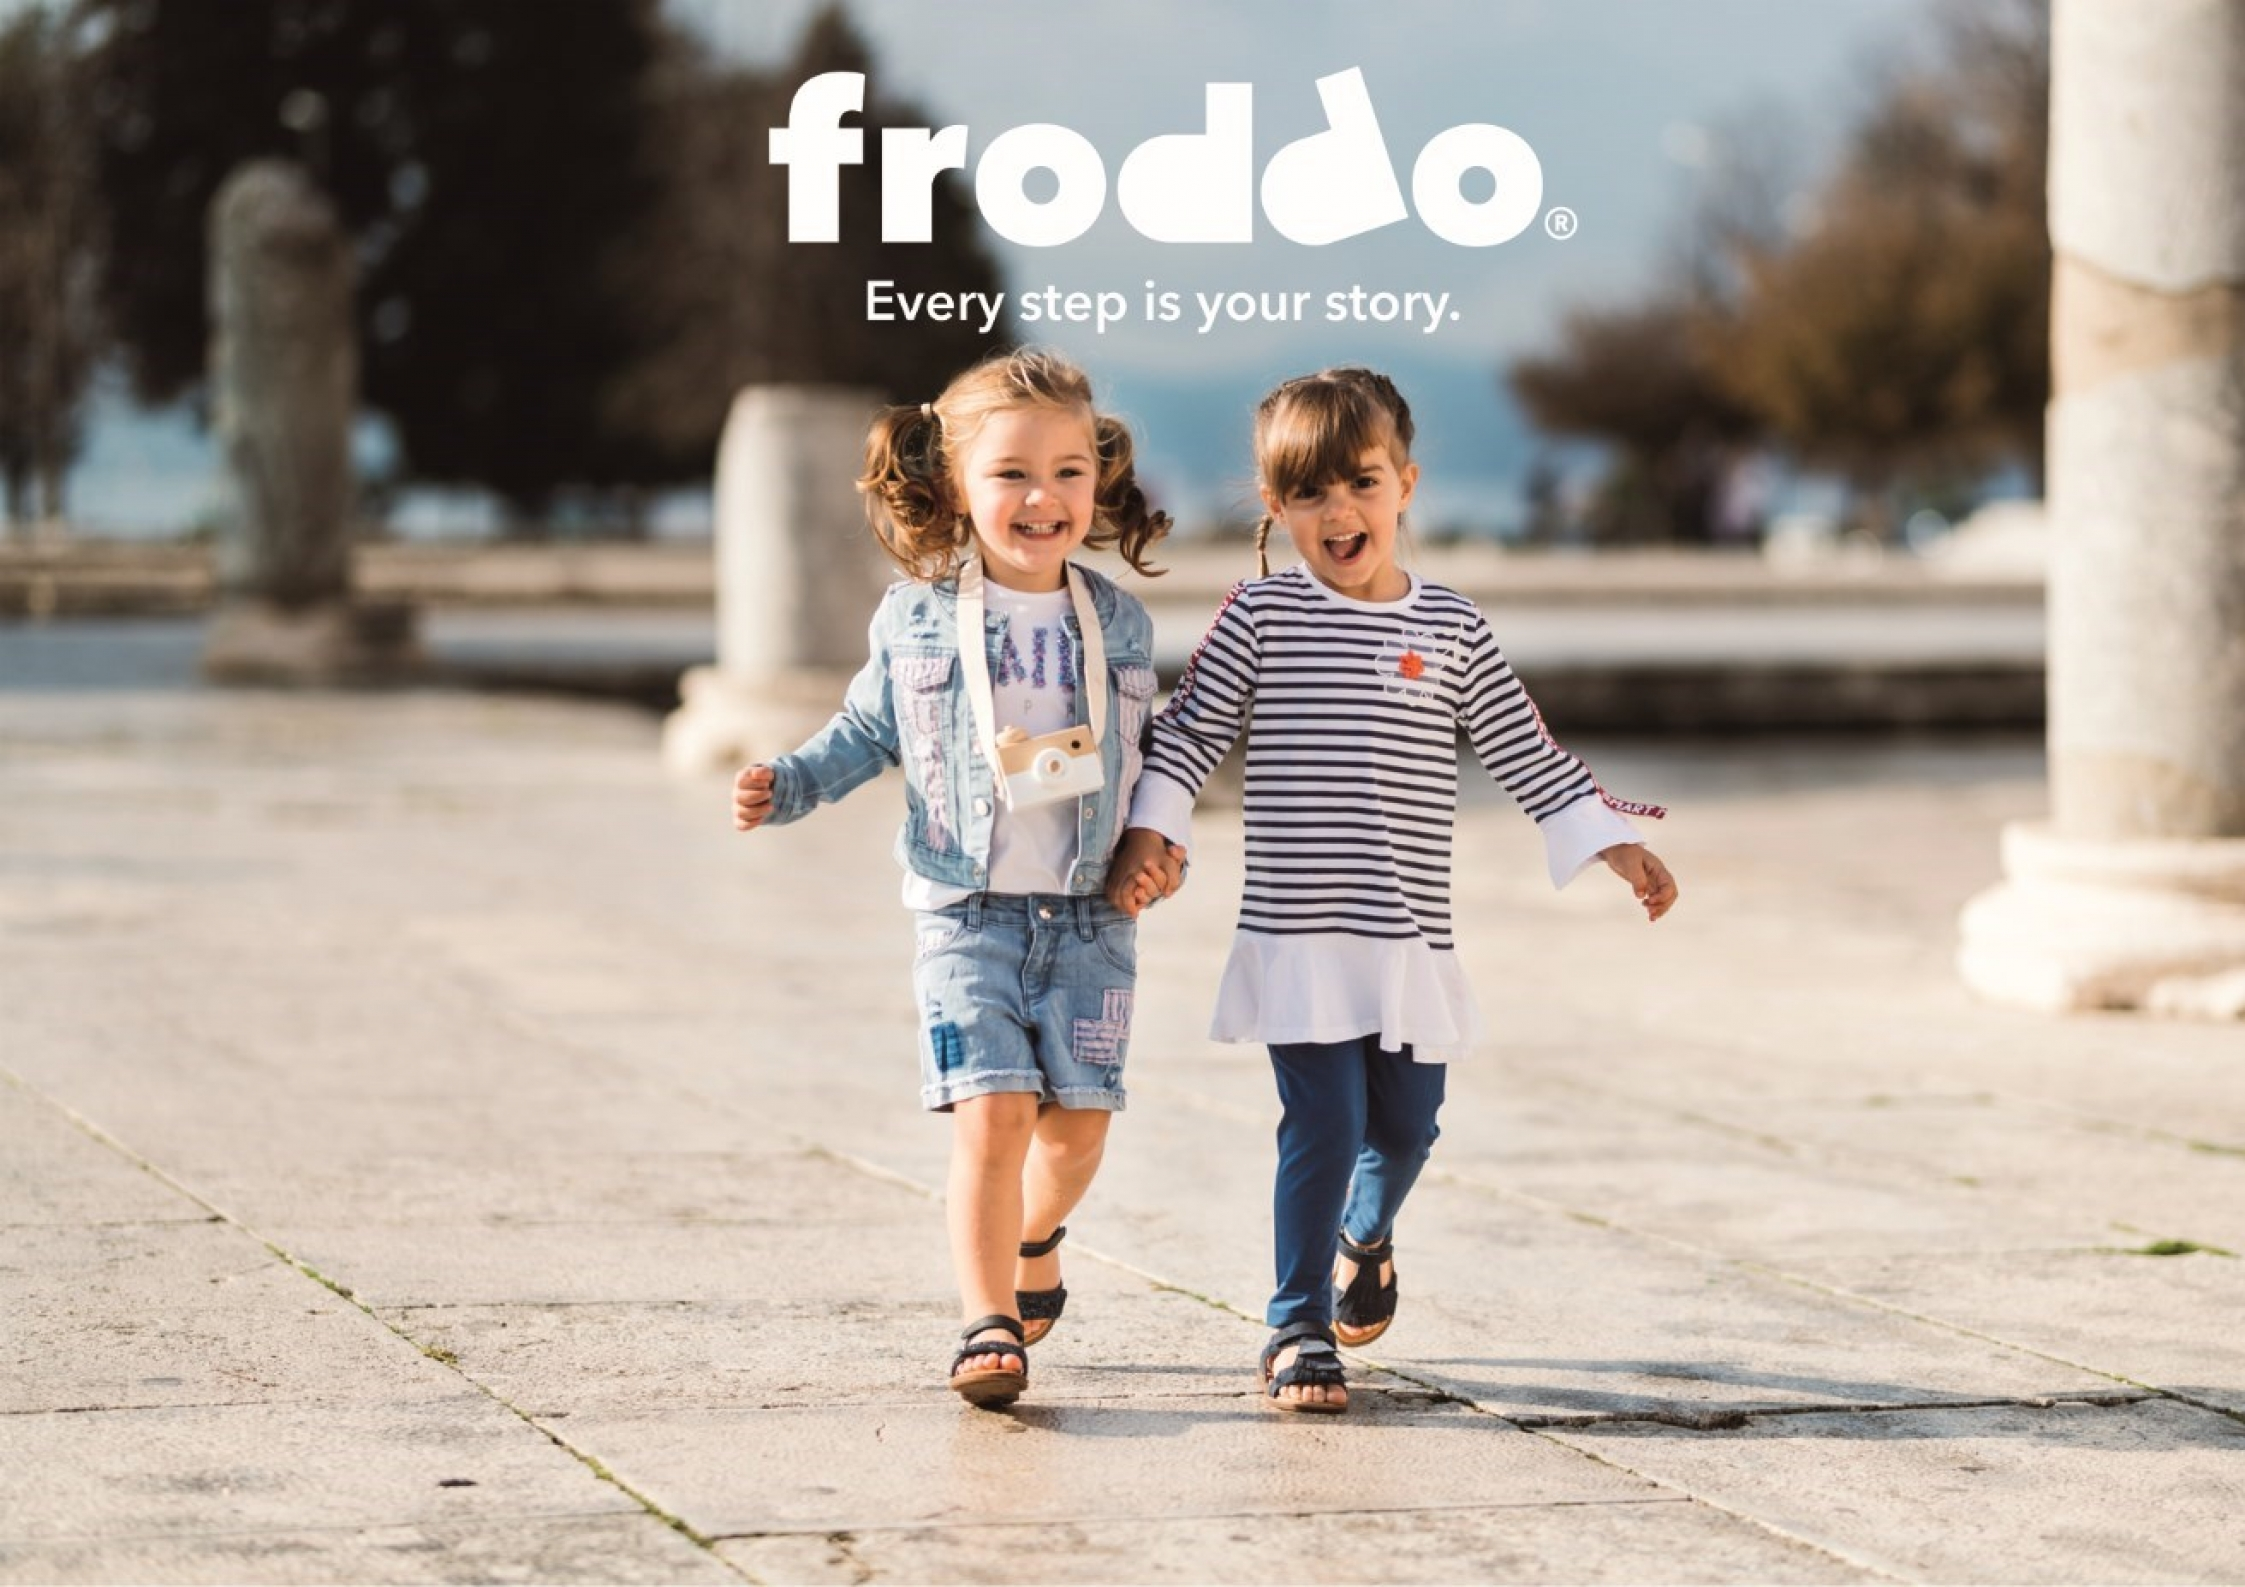 froddo1